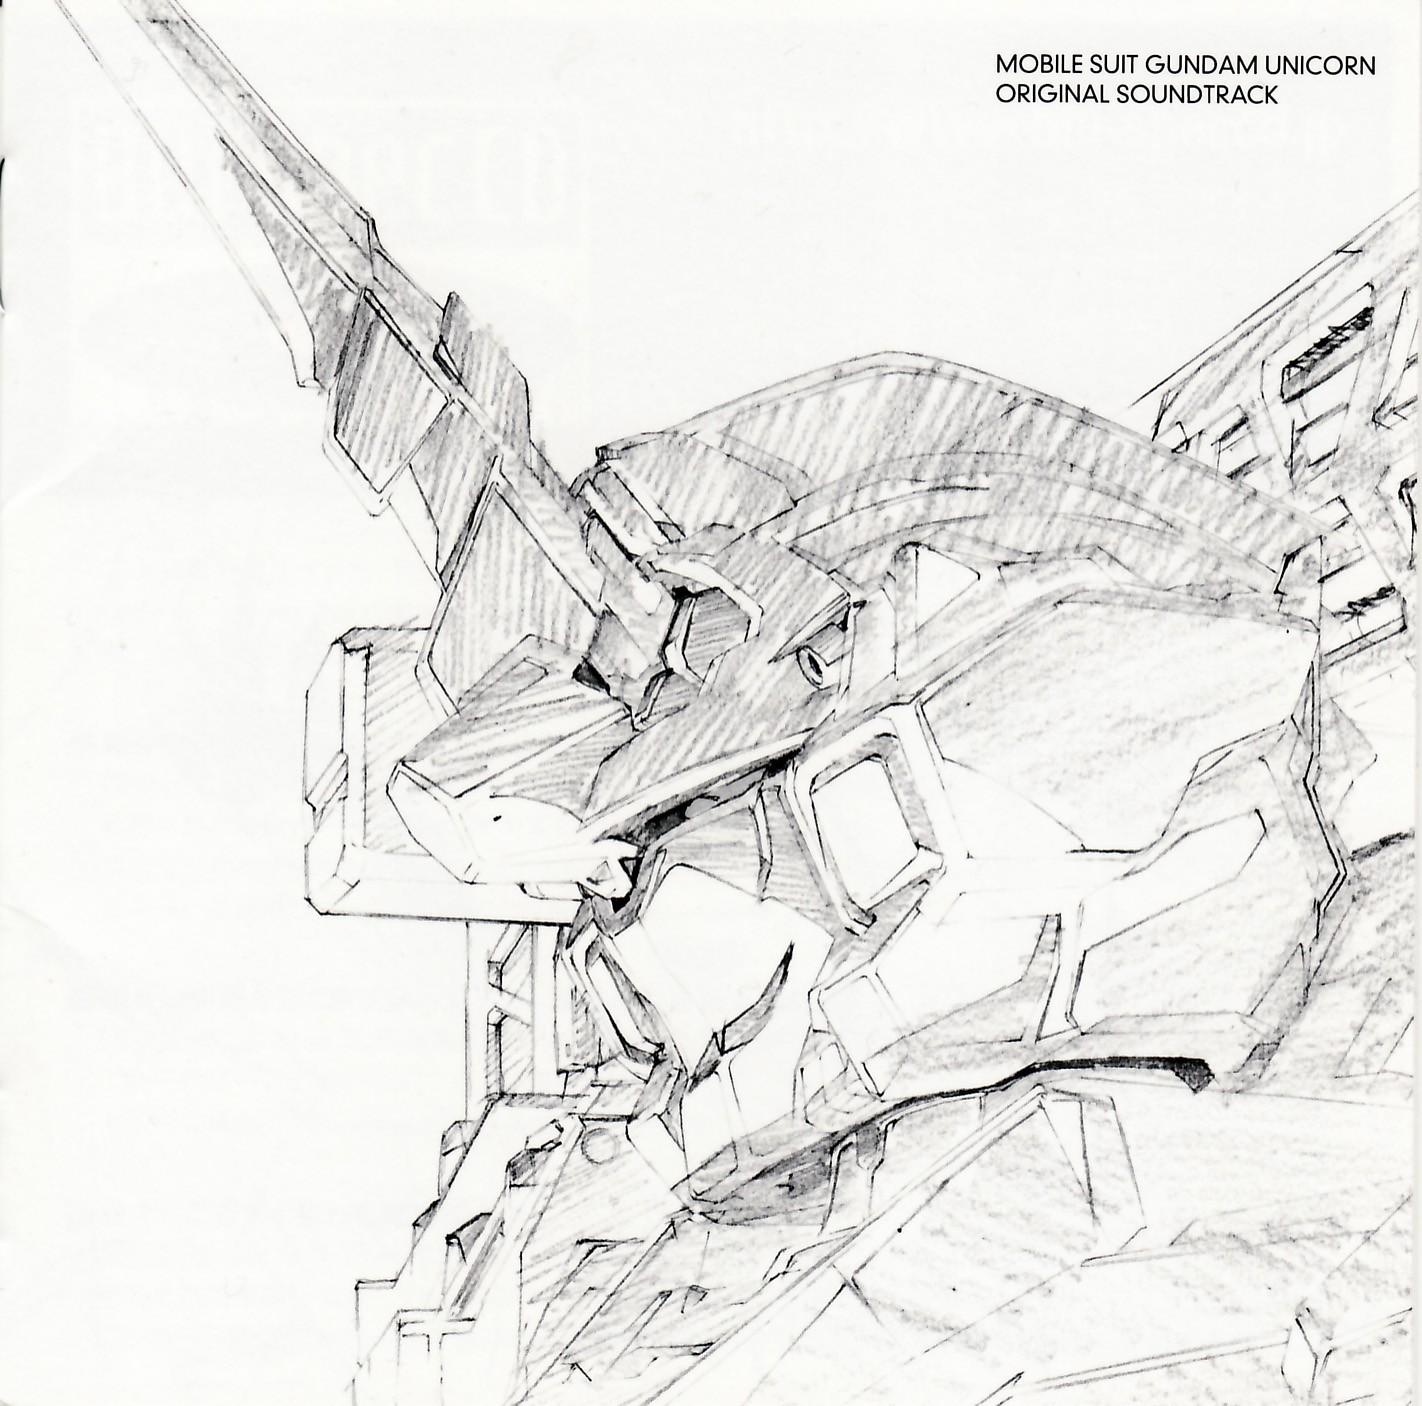 Tapety Ilustrace Anime Umelecka Dila Kresba Tuzkou Kreslena